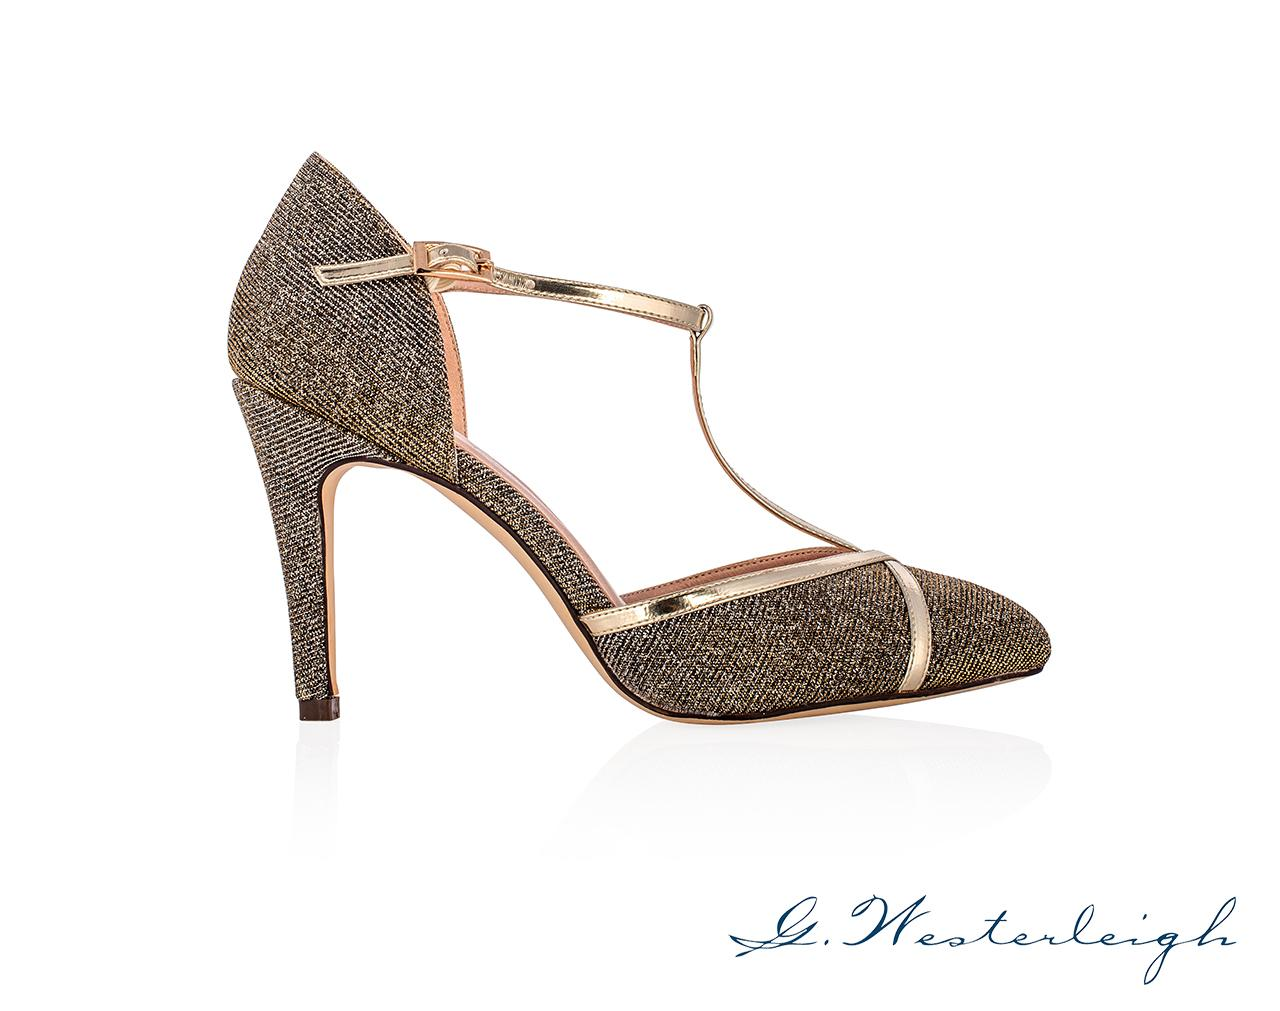 Spoločenské topánky Zaragoza - Obrázok č. 2